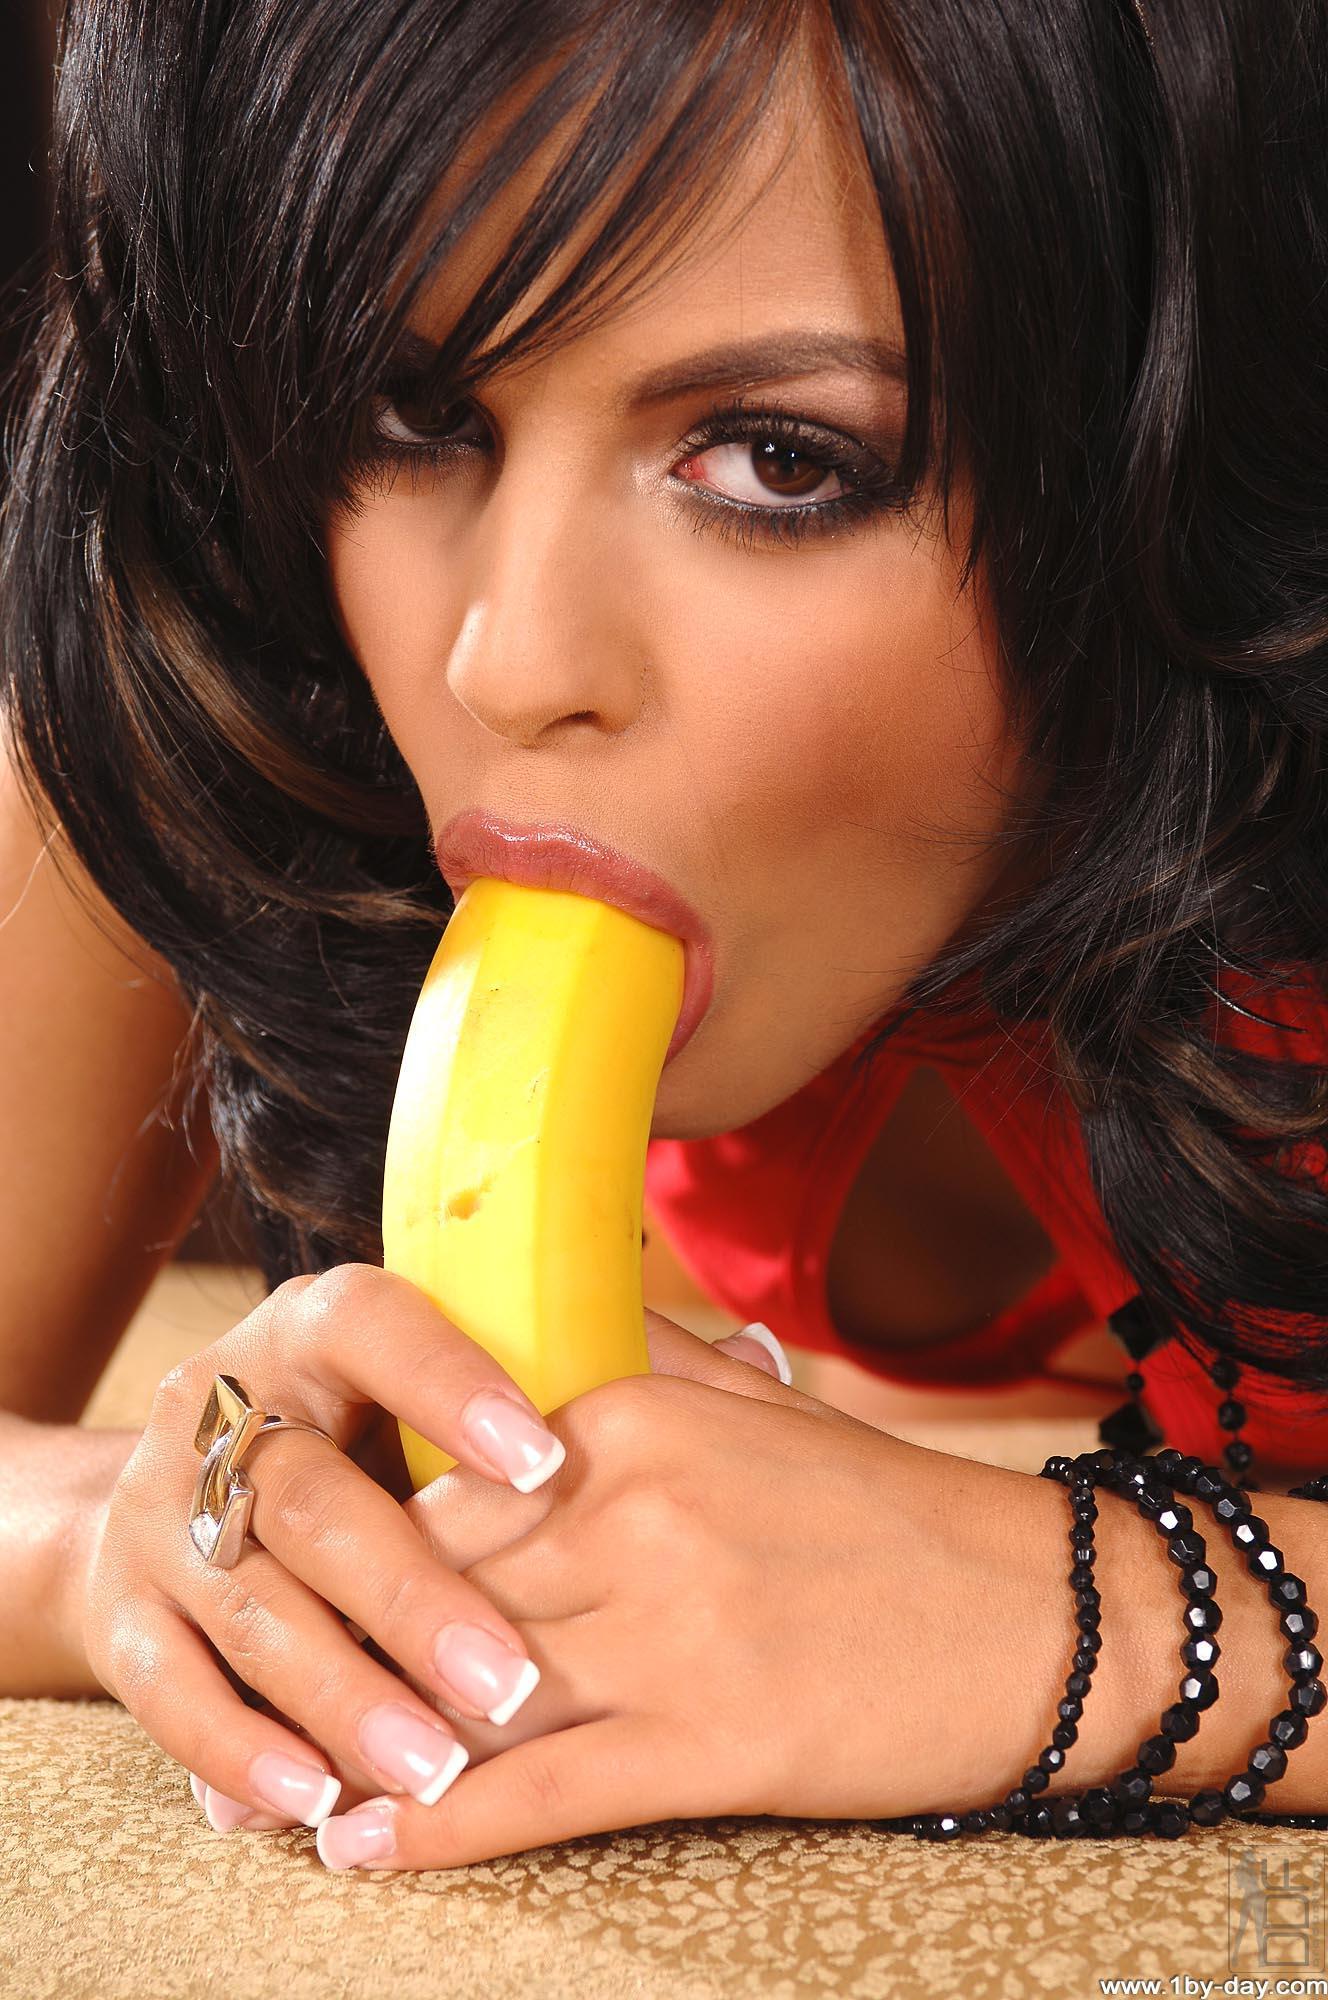 Banana deepthroat